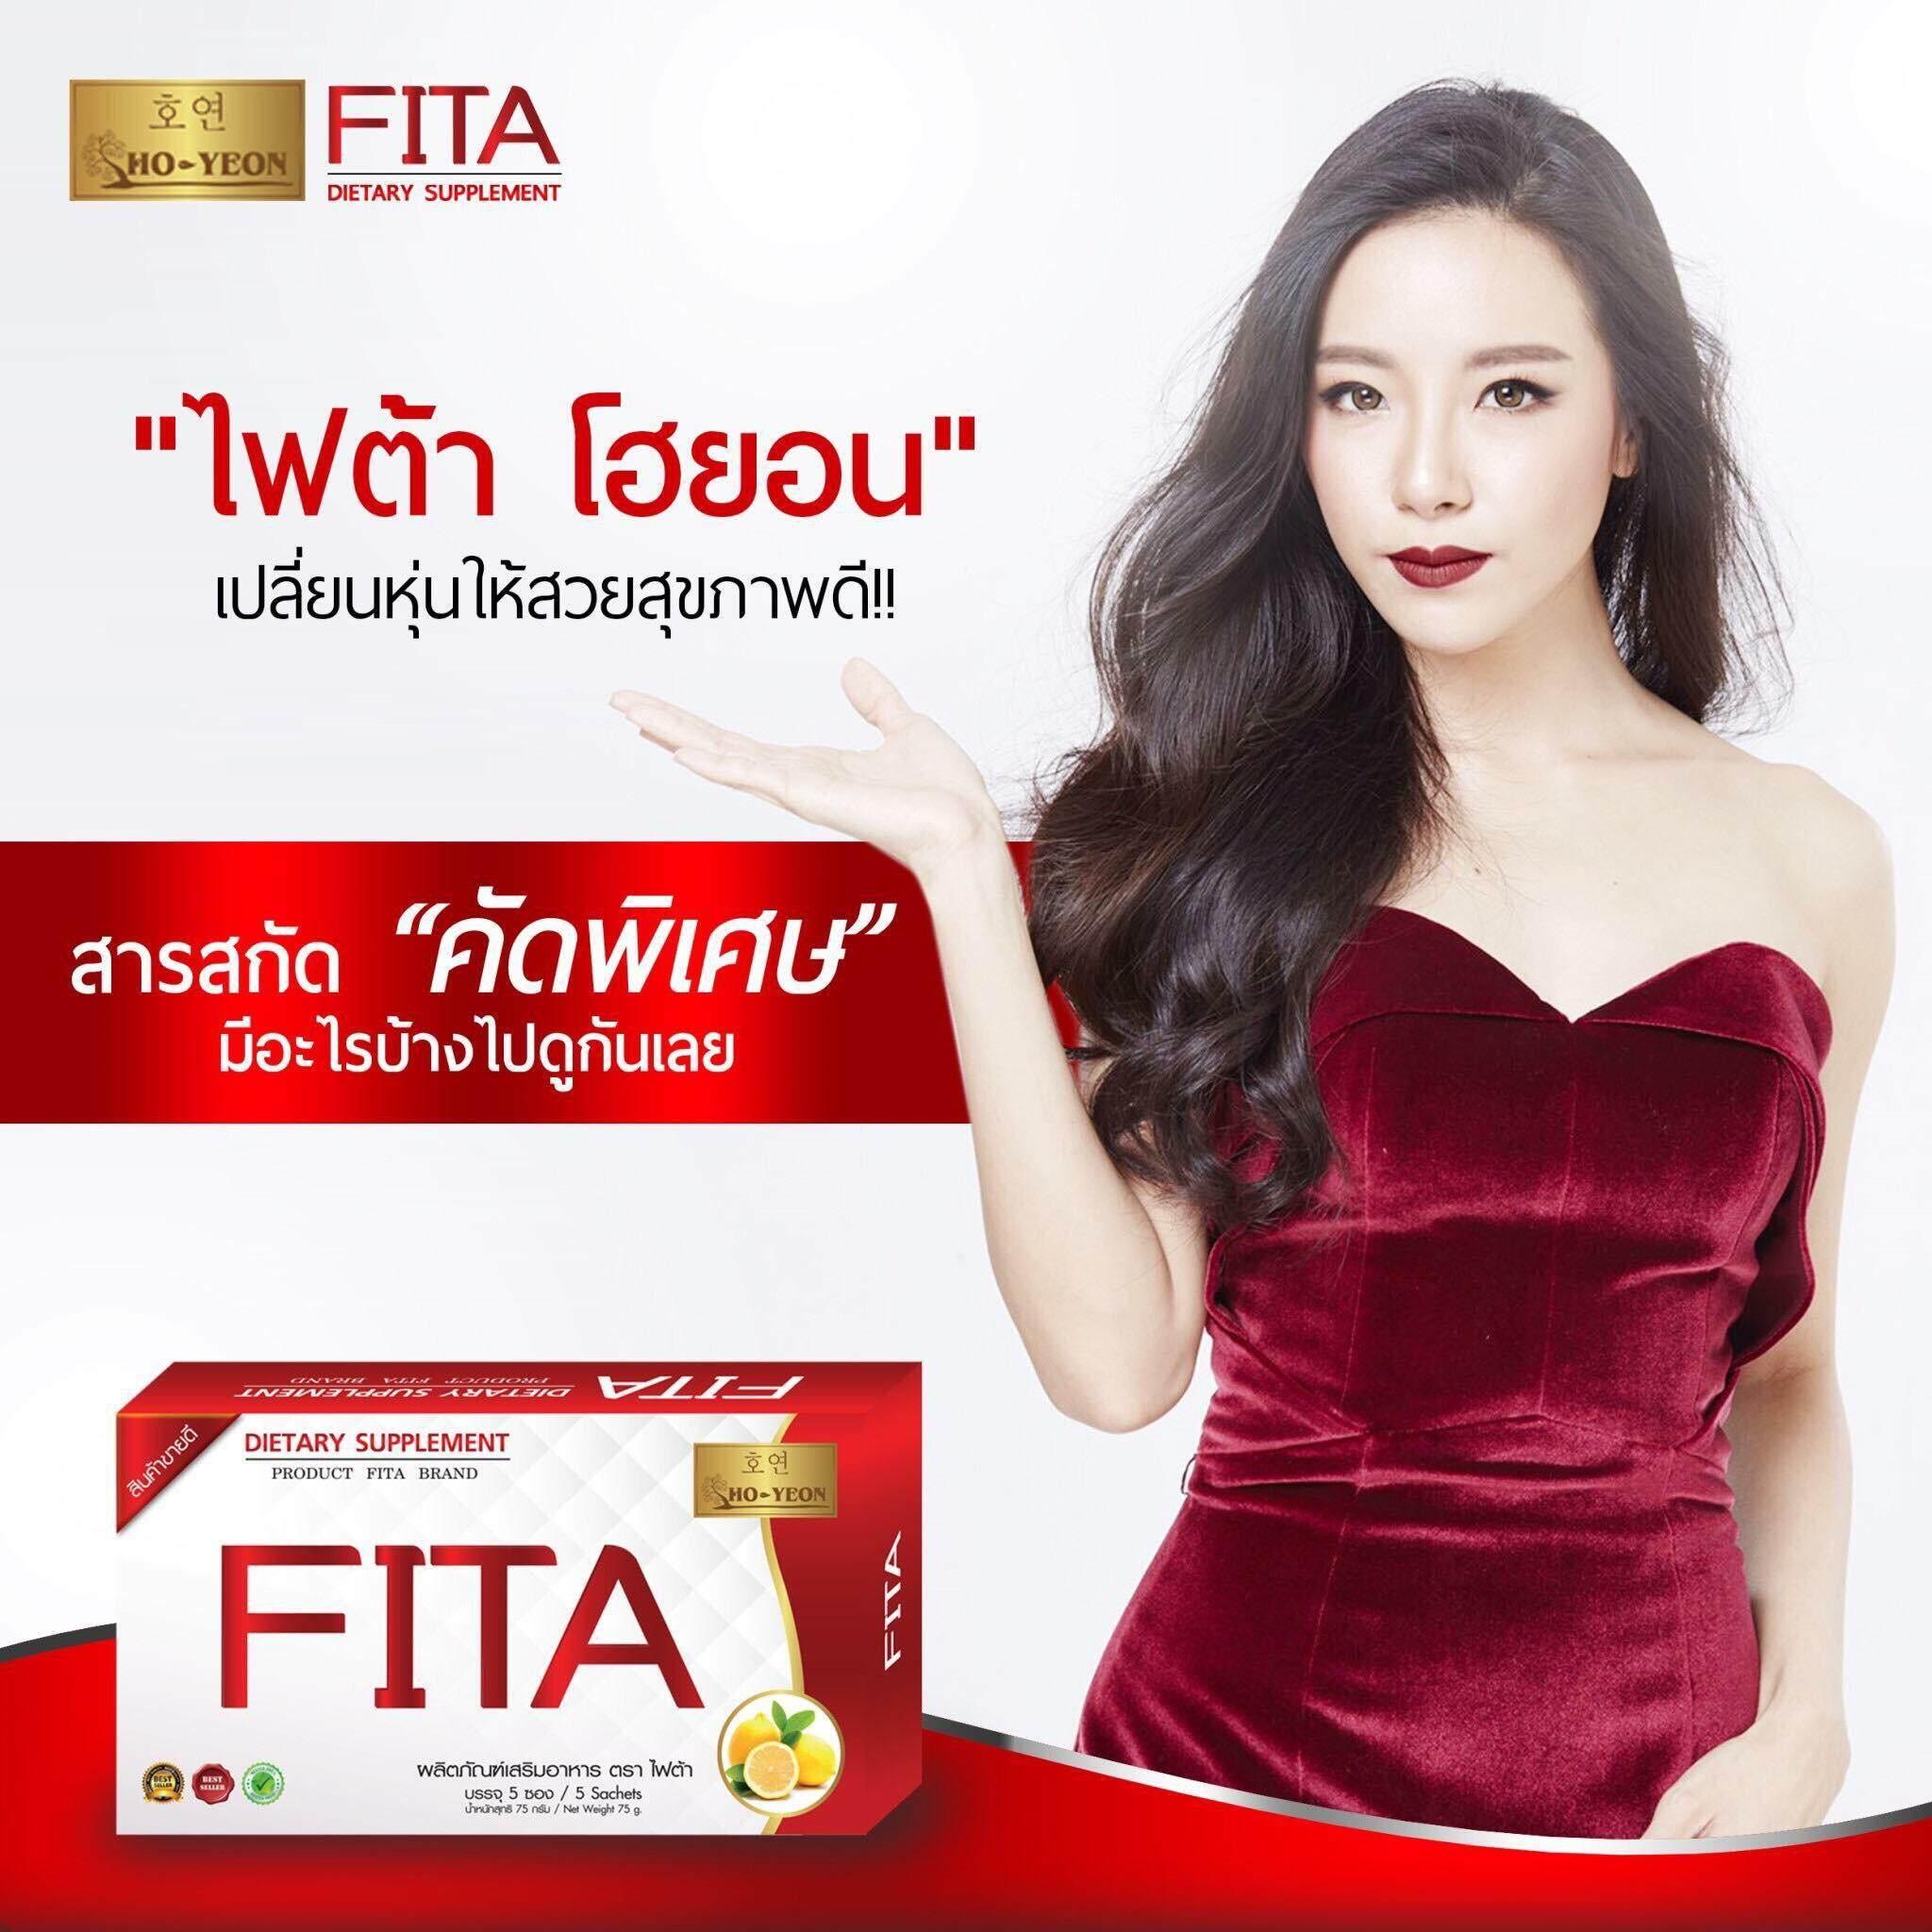 FITA (5).jpg